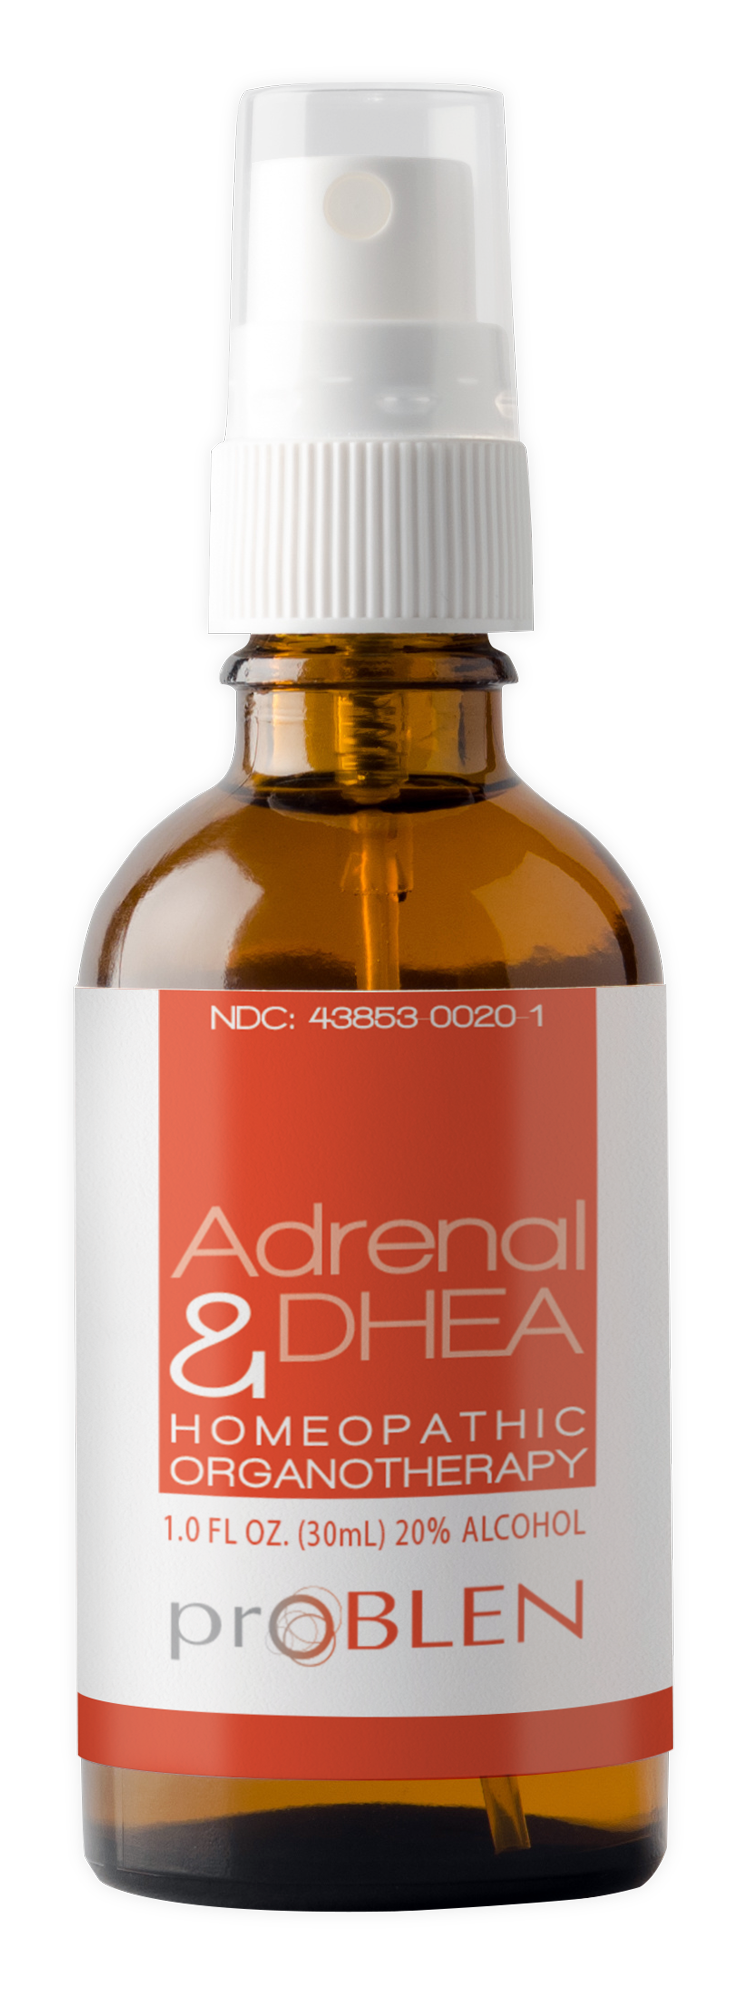 Adrenal DHEA Hormone Booster | ProBLEN